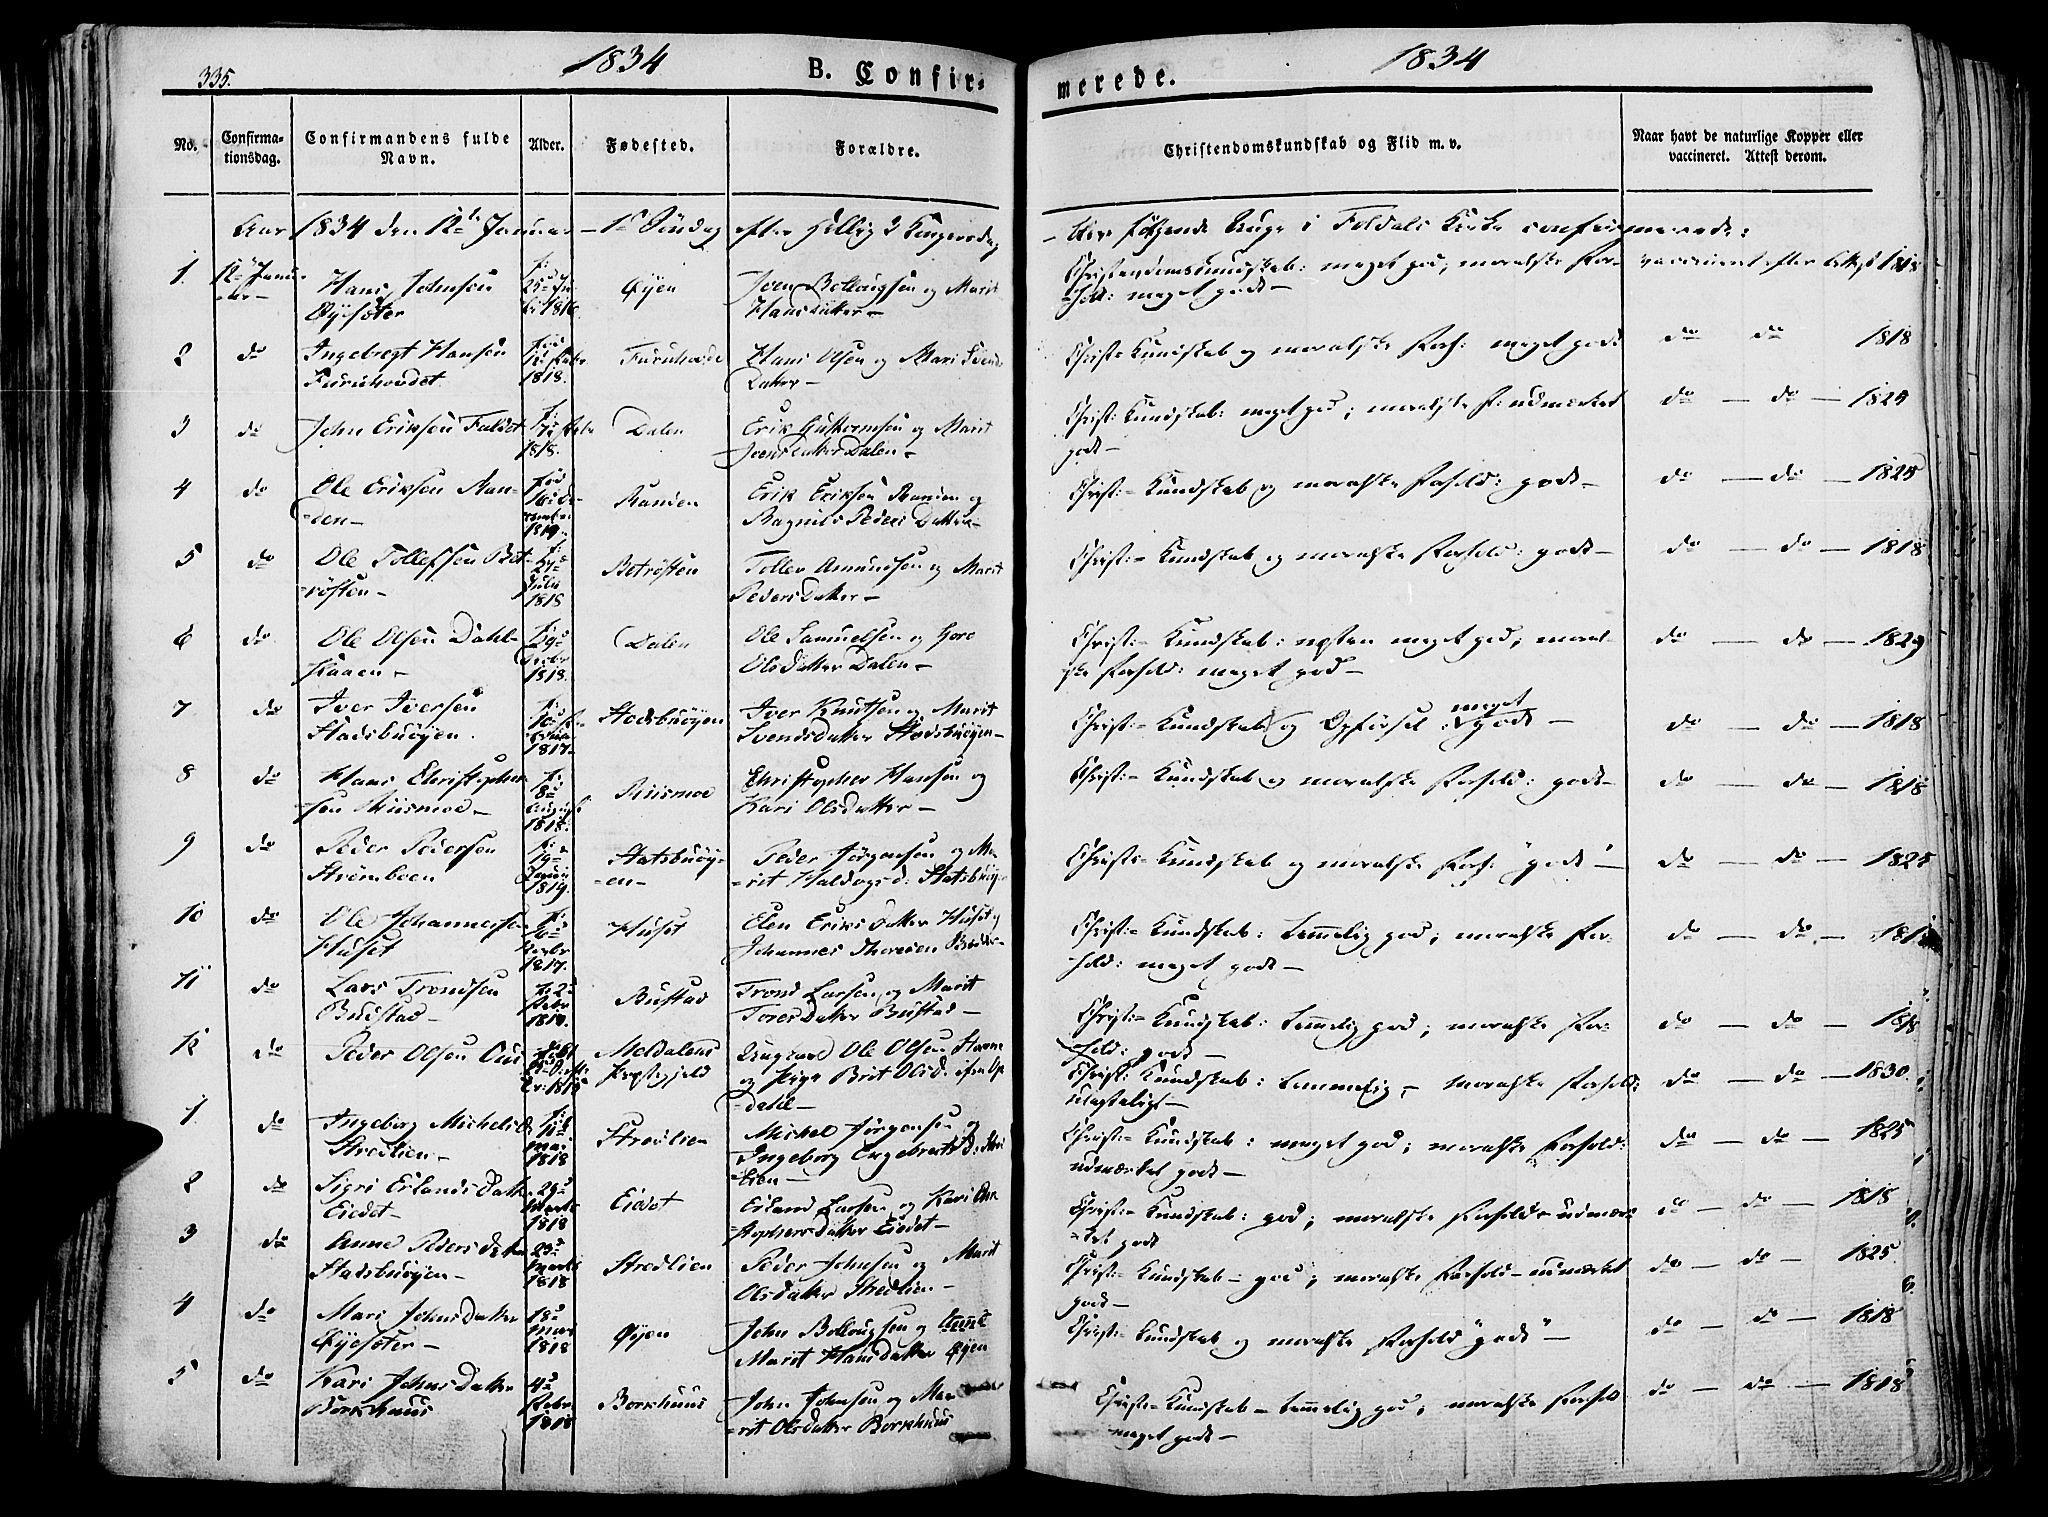 SAH, Lesja prestekontor, Ministerialbok nr. 5, 1830-1842, s. 335